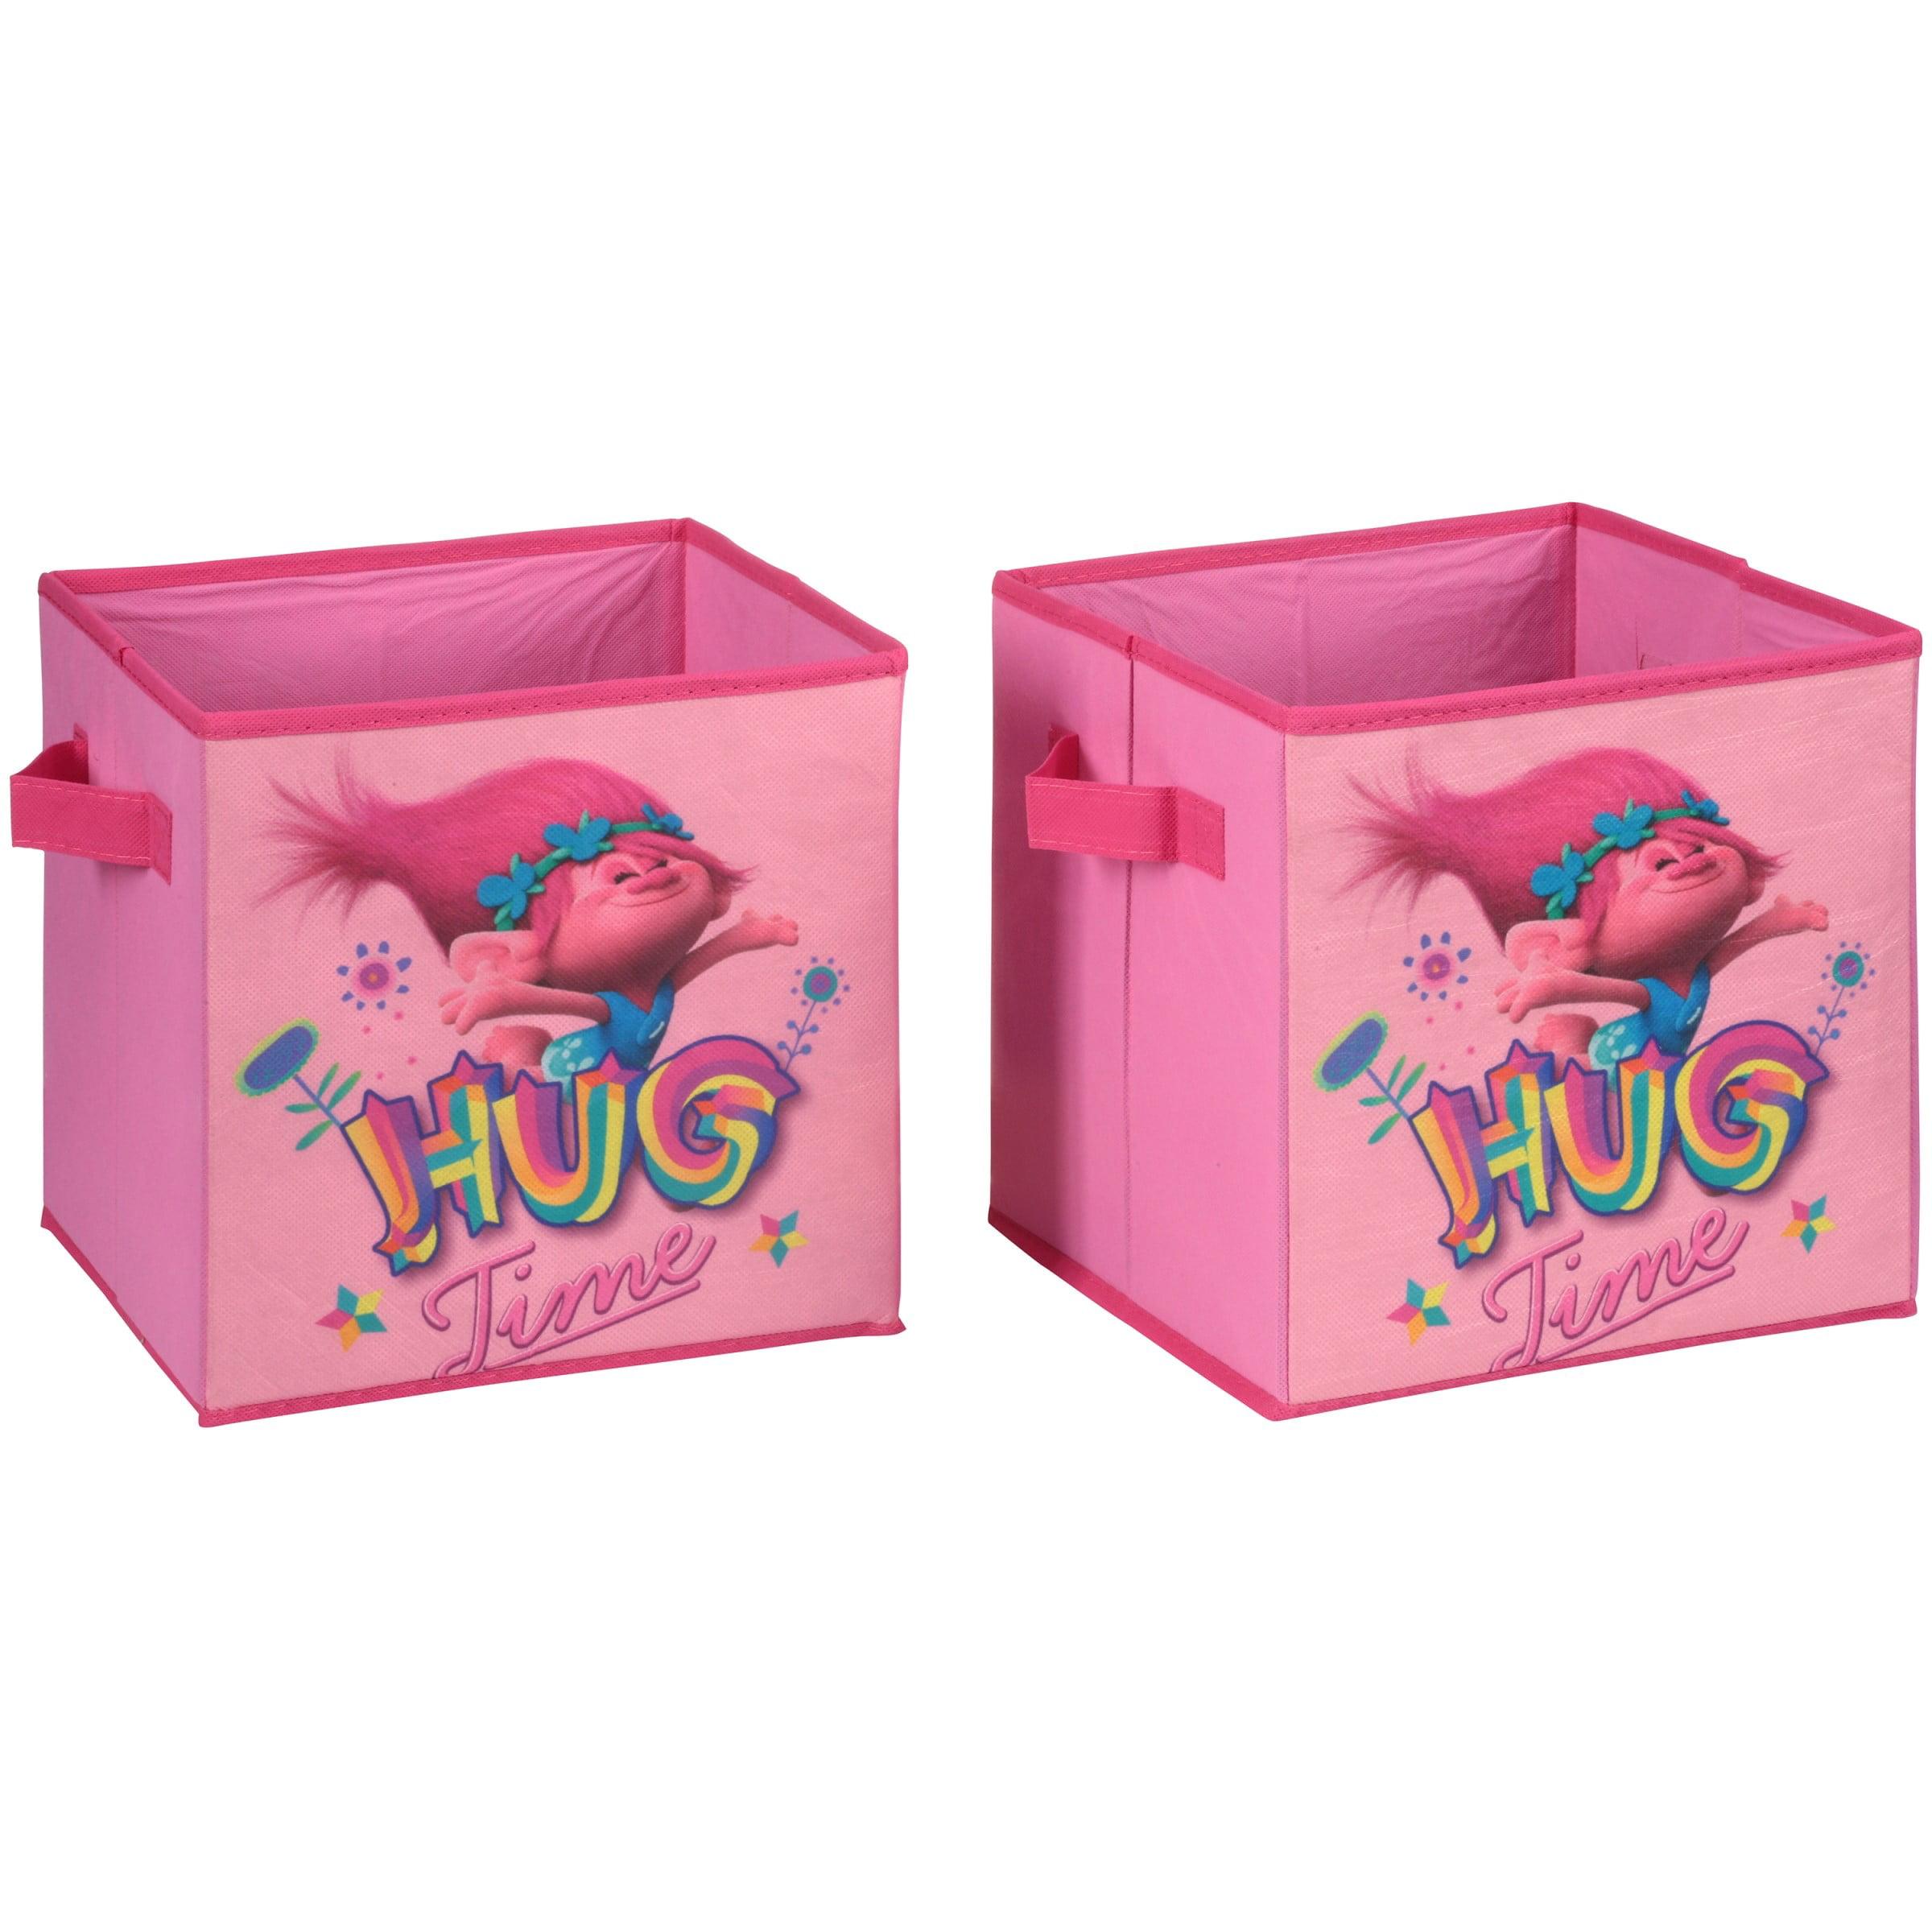 Dreamworks Trolls Storage Cubes, 2 Pack